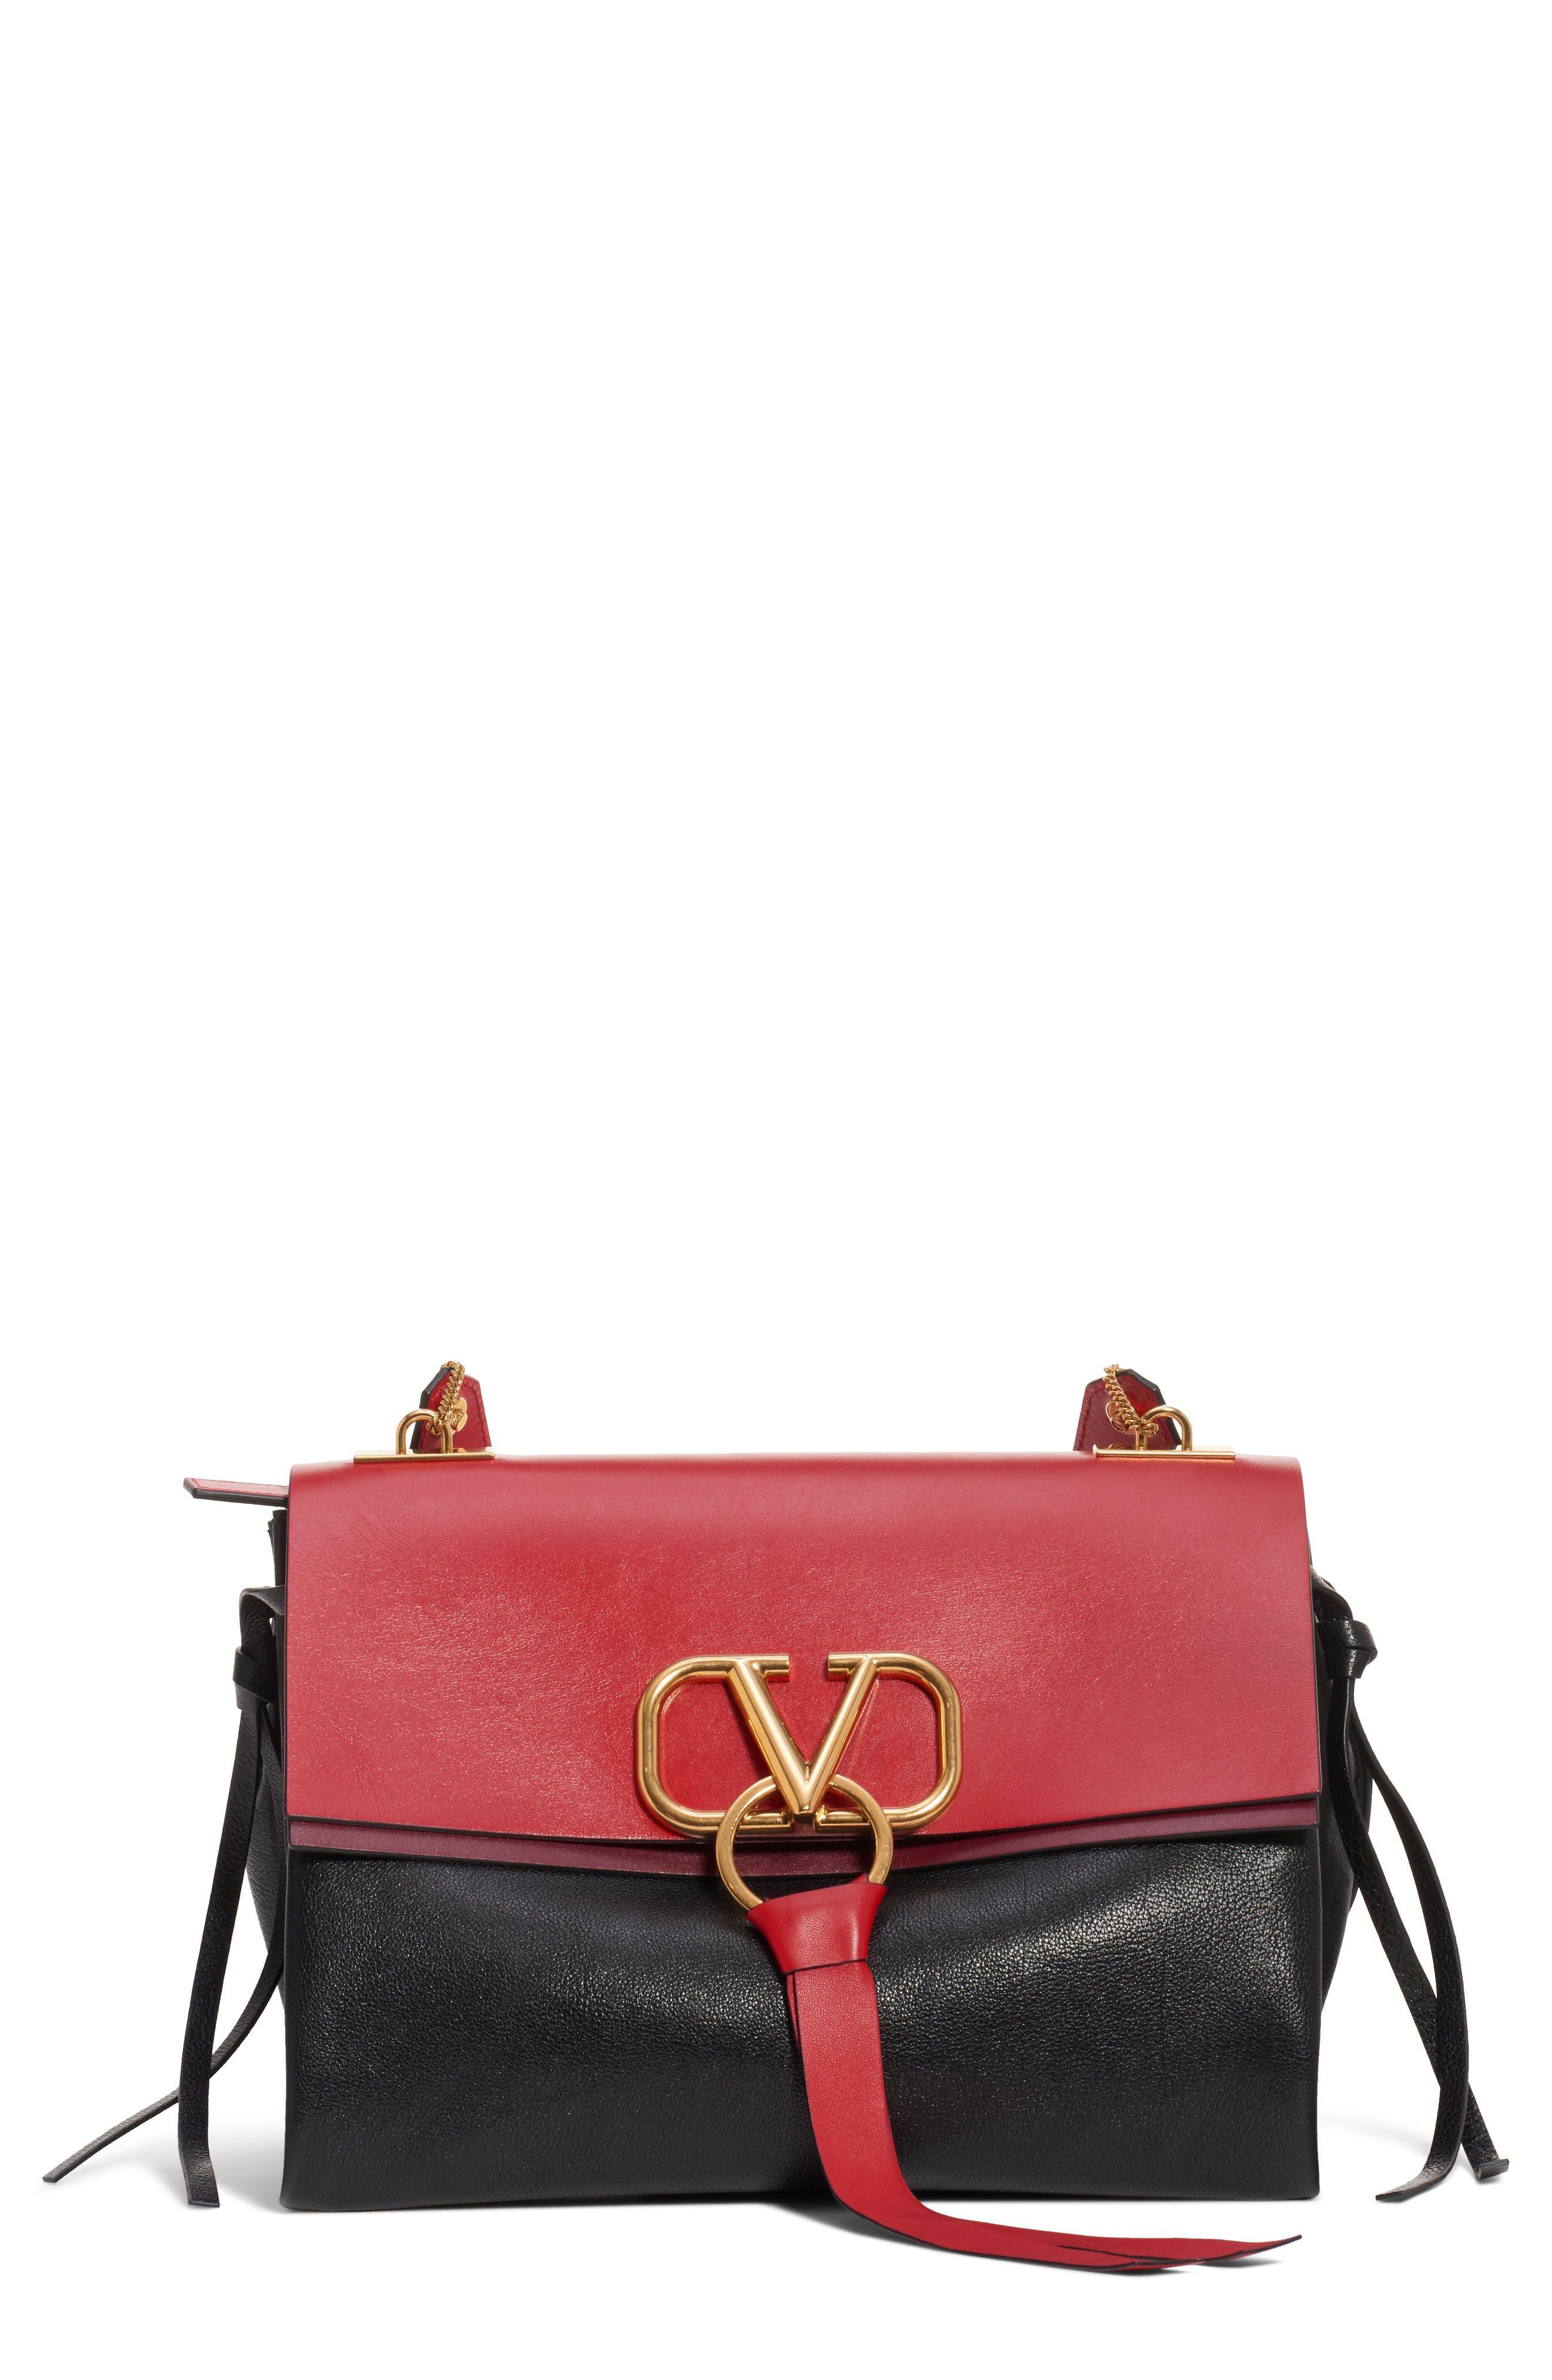 Medium V-Ring Leather Shoulder Bag,                             Main thumbnail 1, color,                             ROUGE PUR-CERISE/ NERO